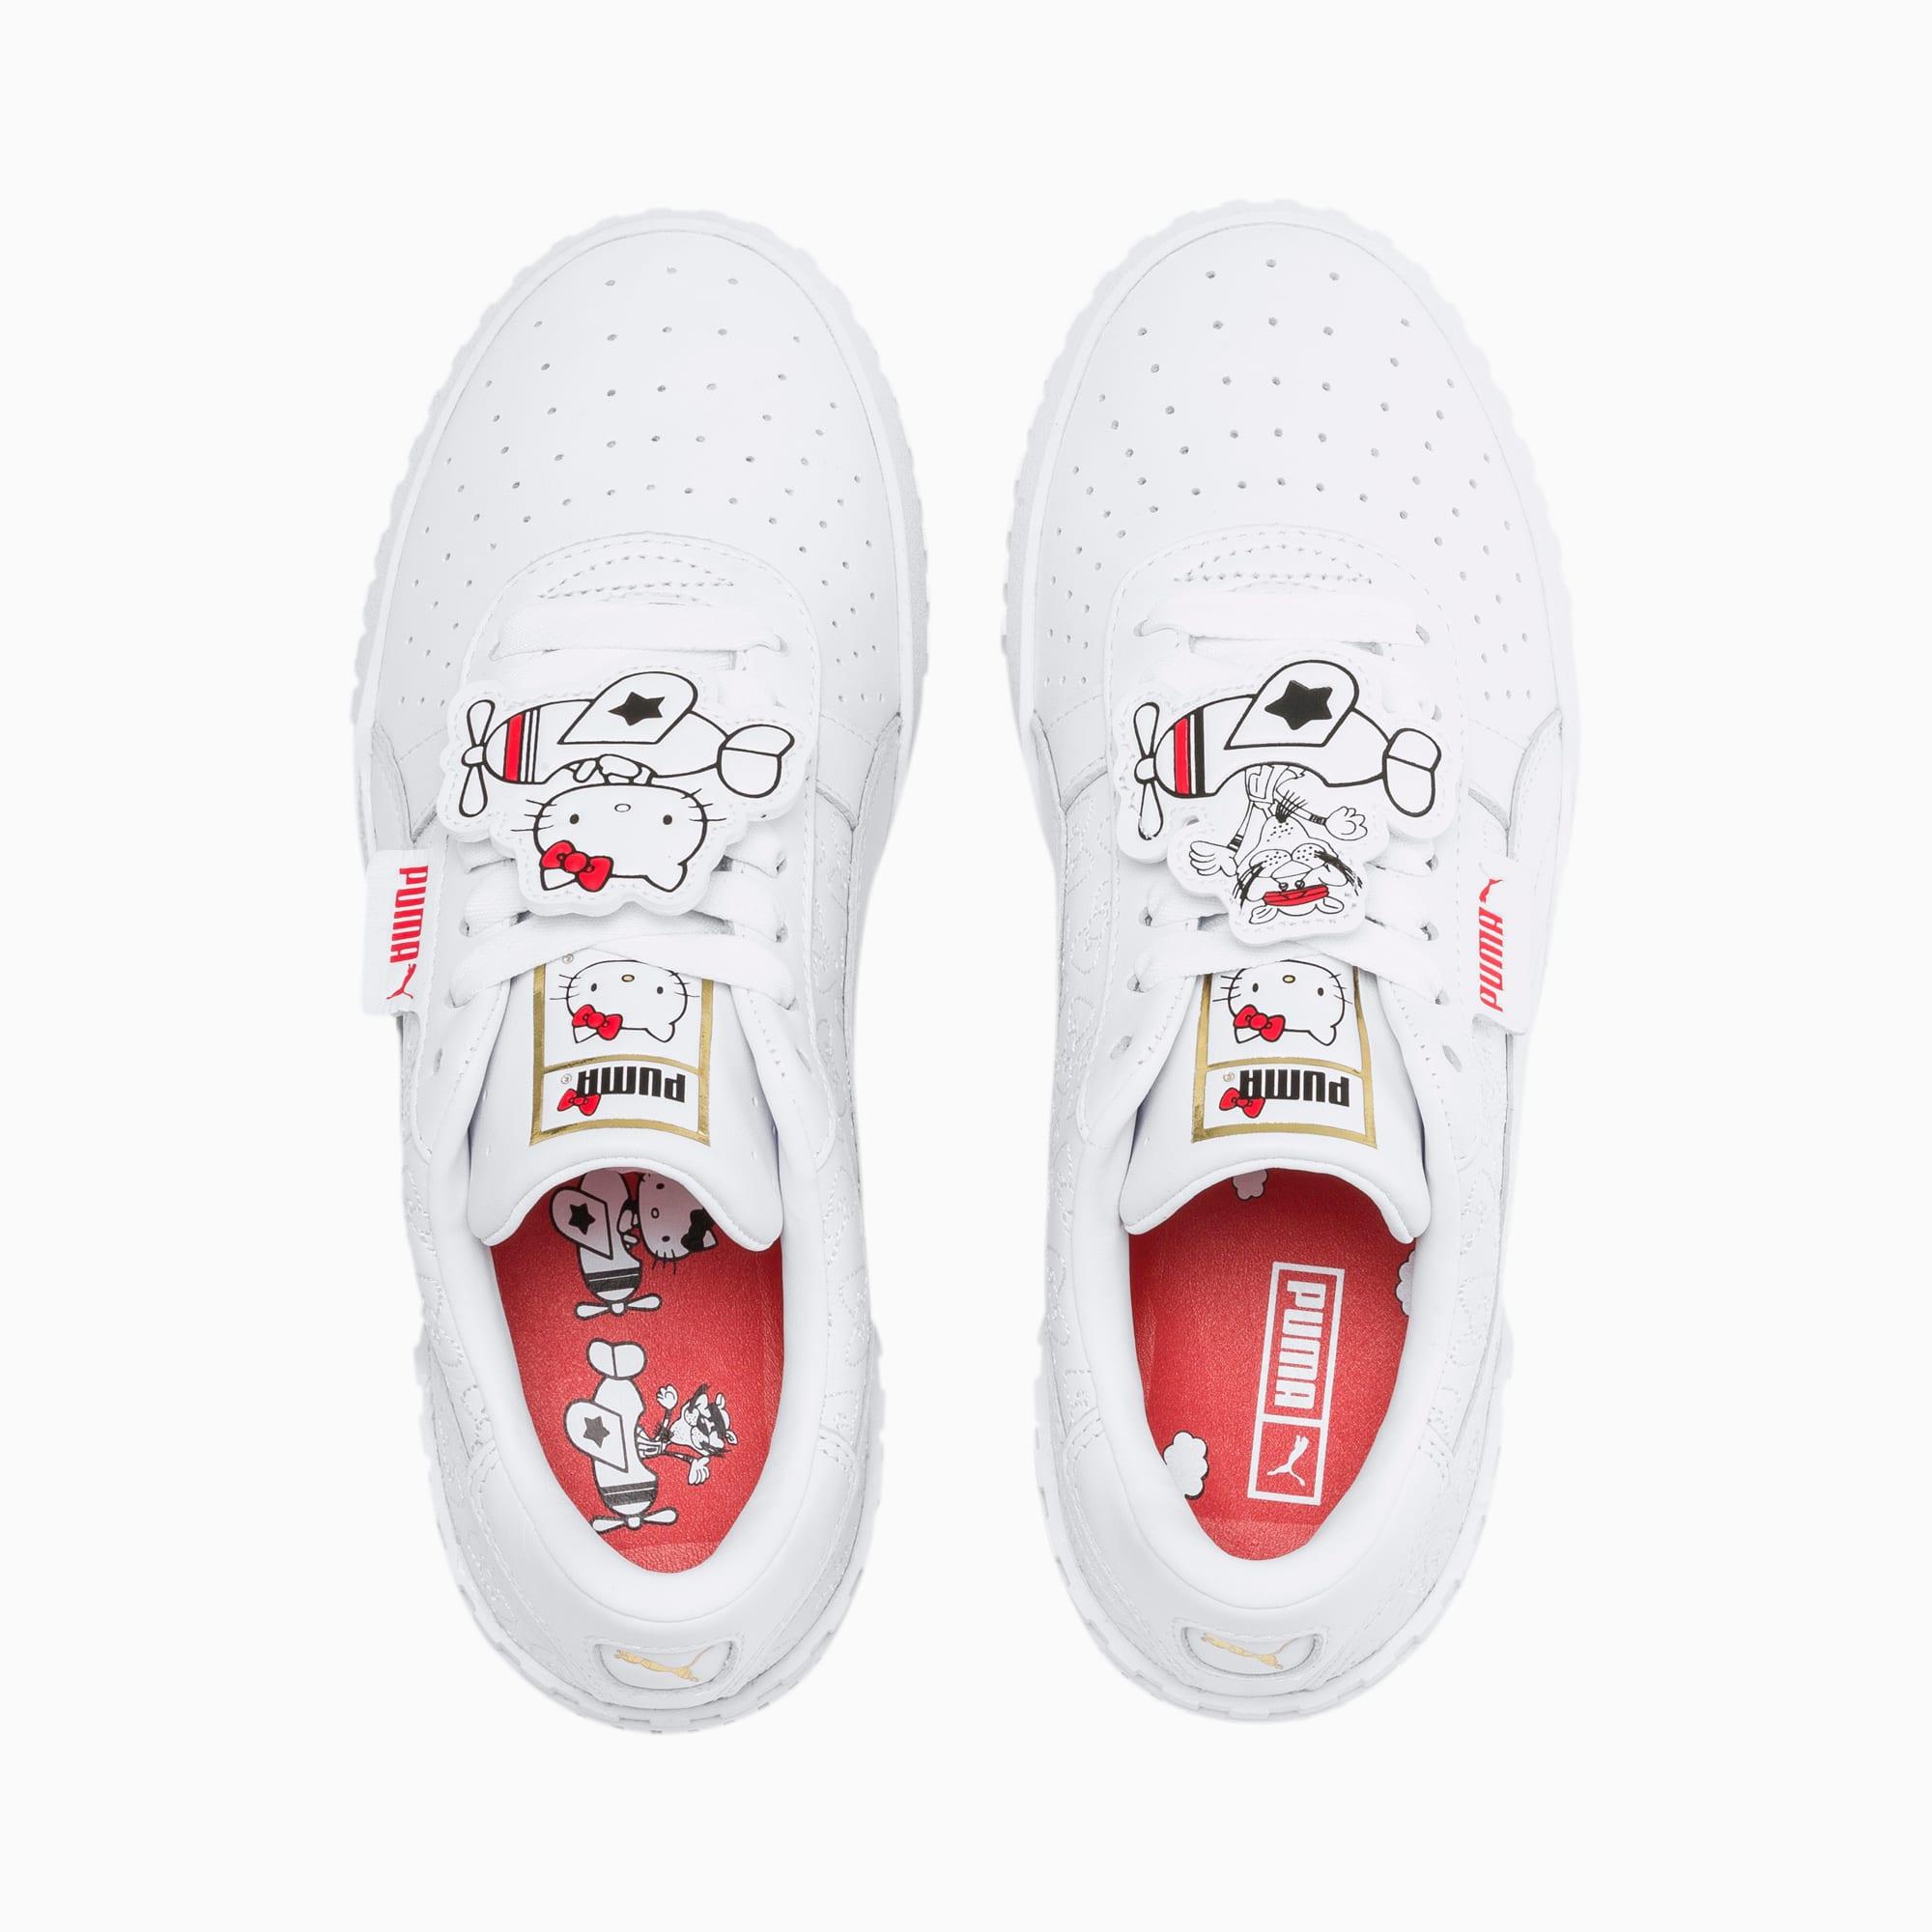 PUMA x HELLO KITTY Cali Women's Sneakers